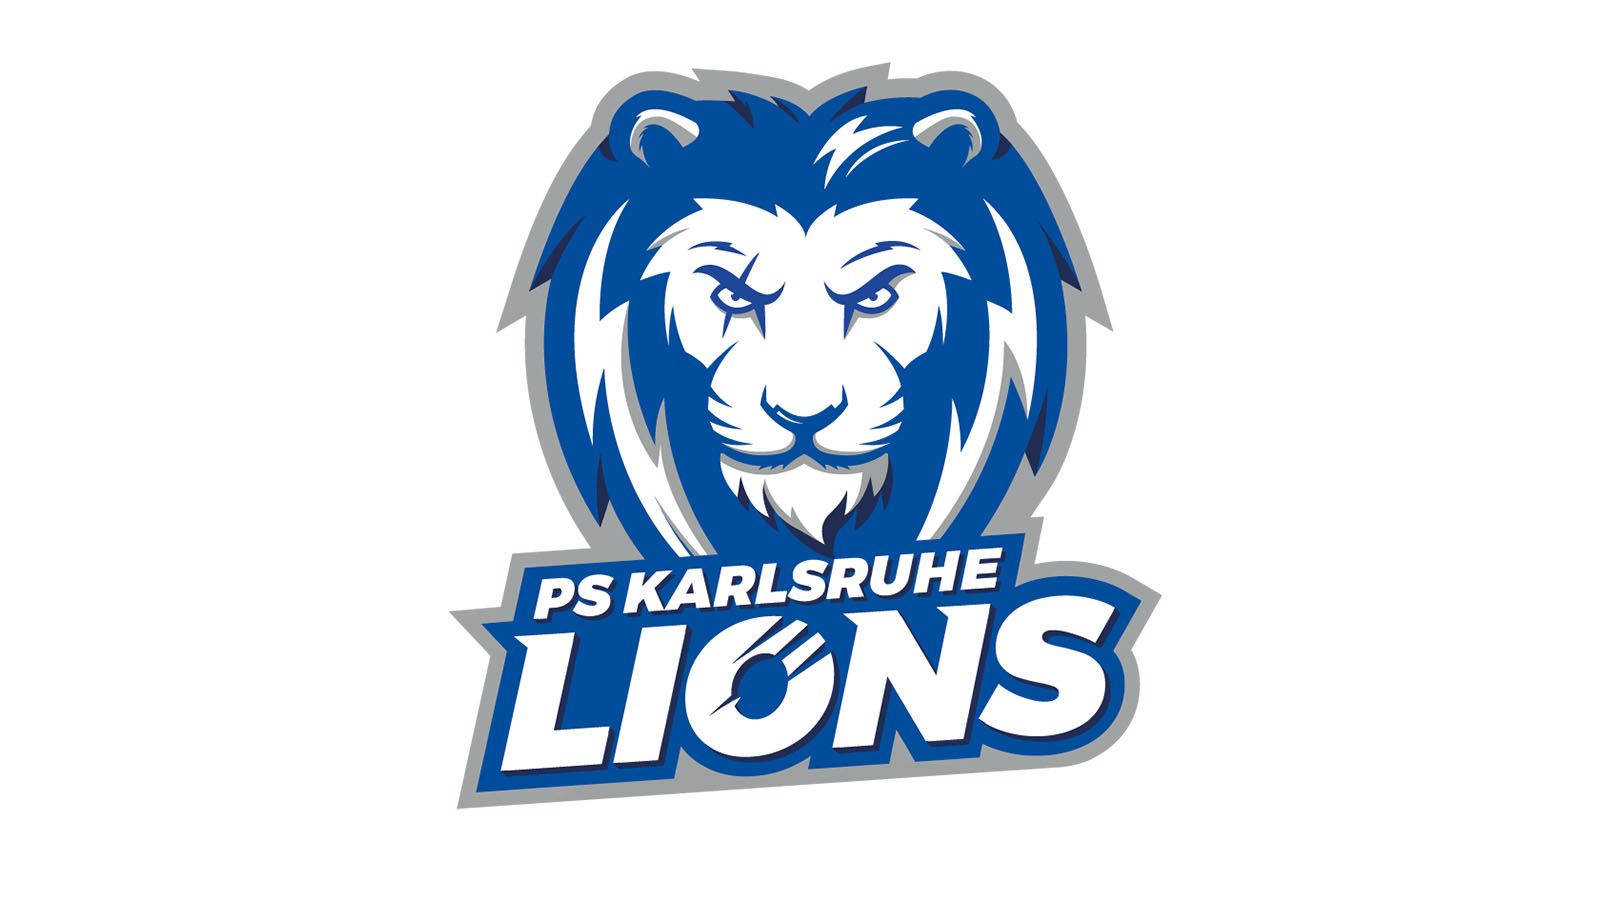 _0051_2041_PS Karlsruhe Lions (2)